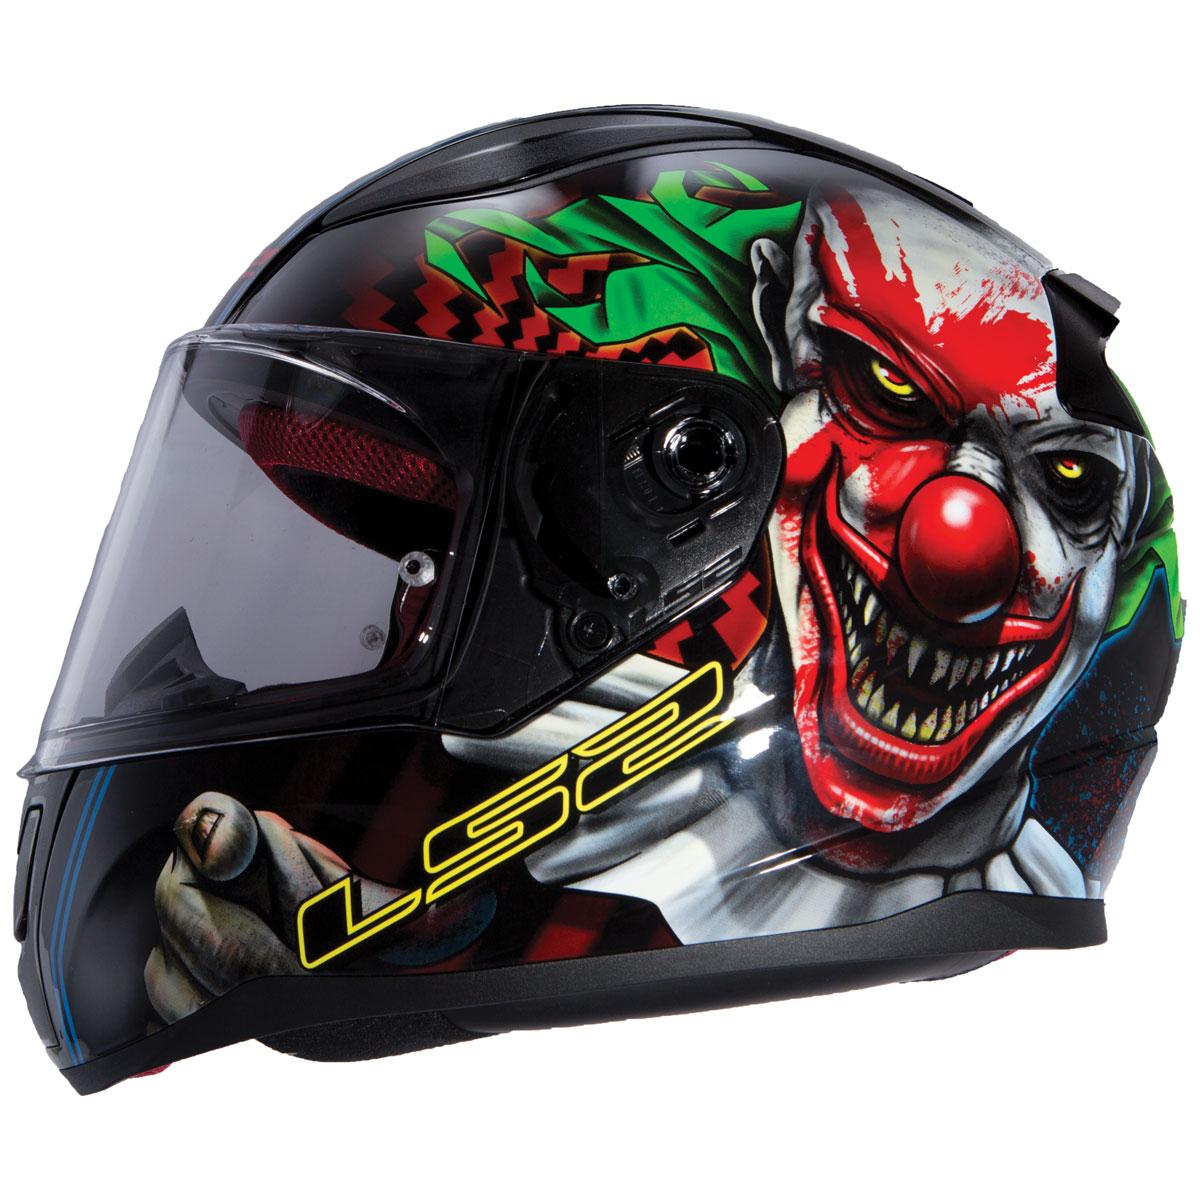 LS2 Rapid Happy Dreams Full Face Helmet